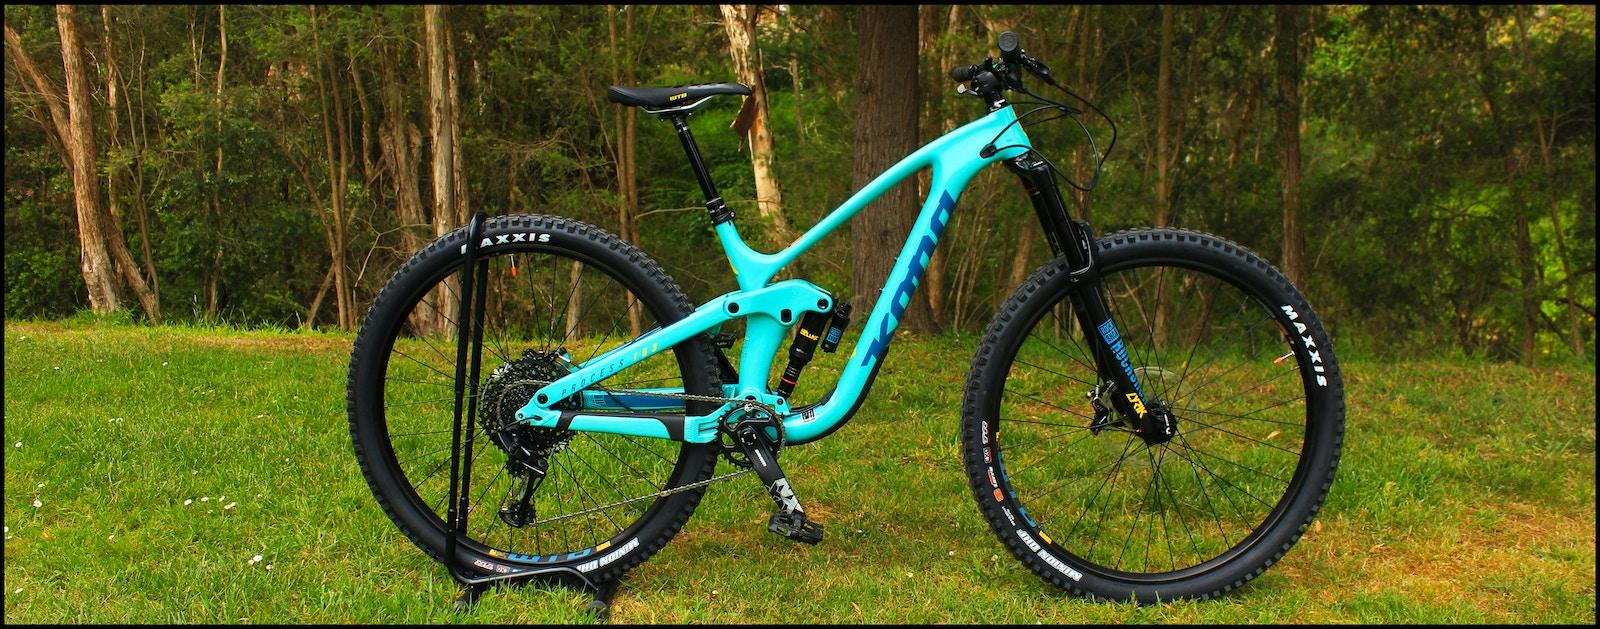 c8b4186d4cf Yarra Valley Cycles